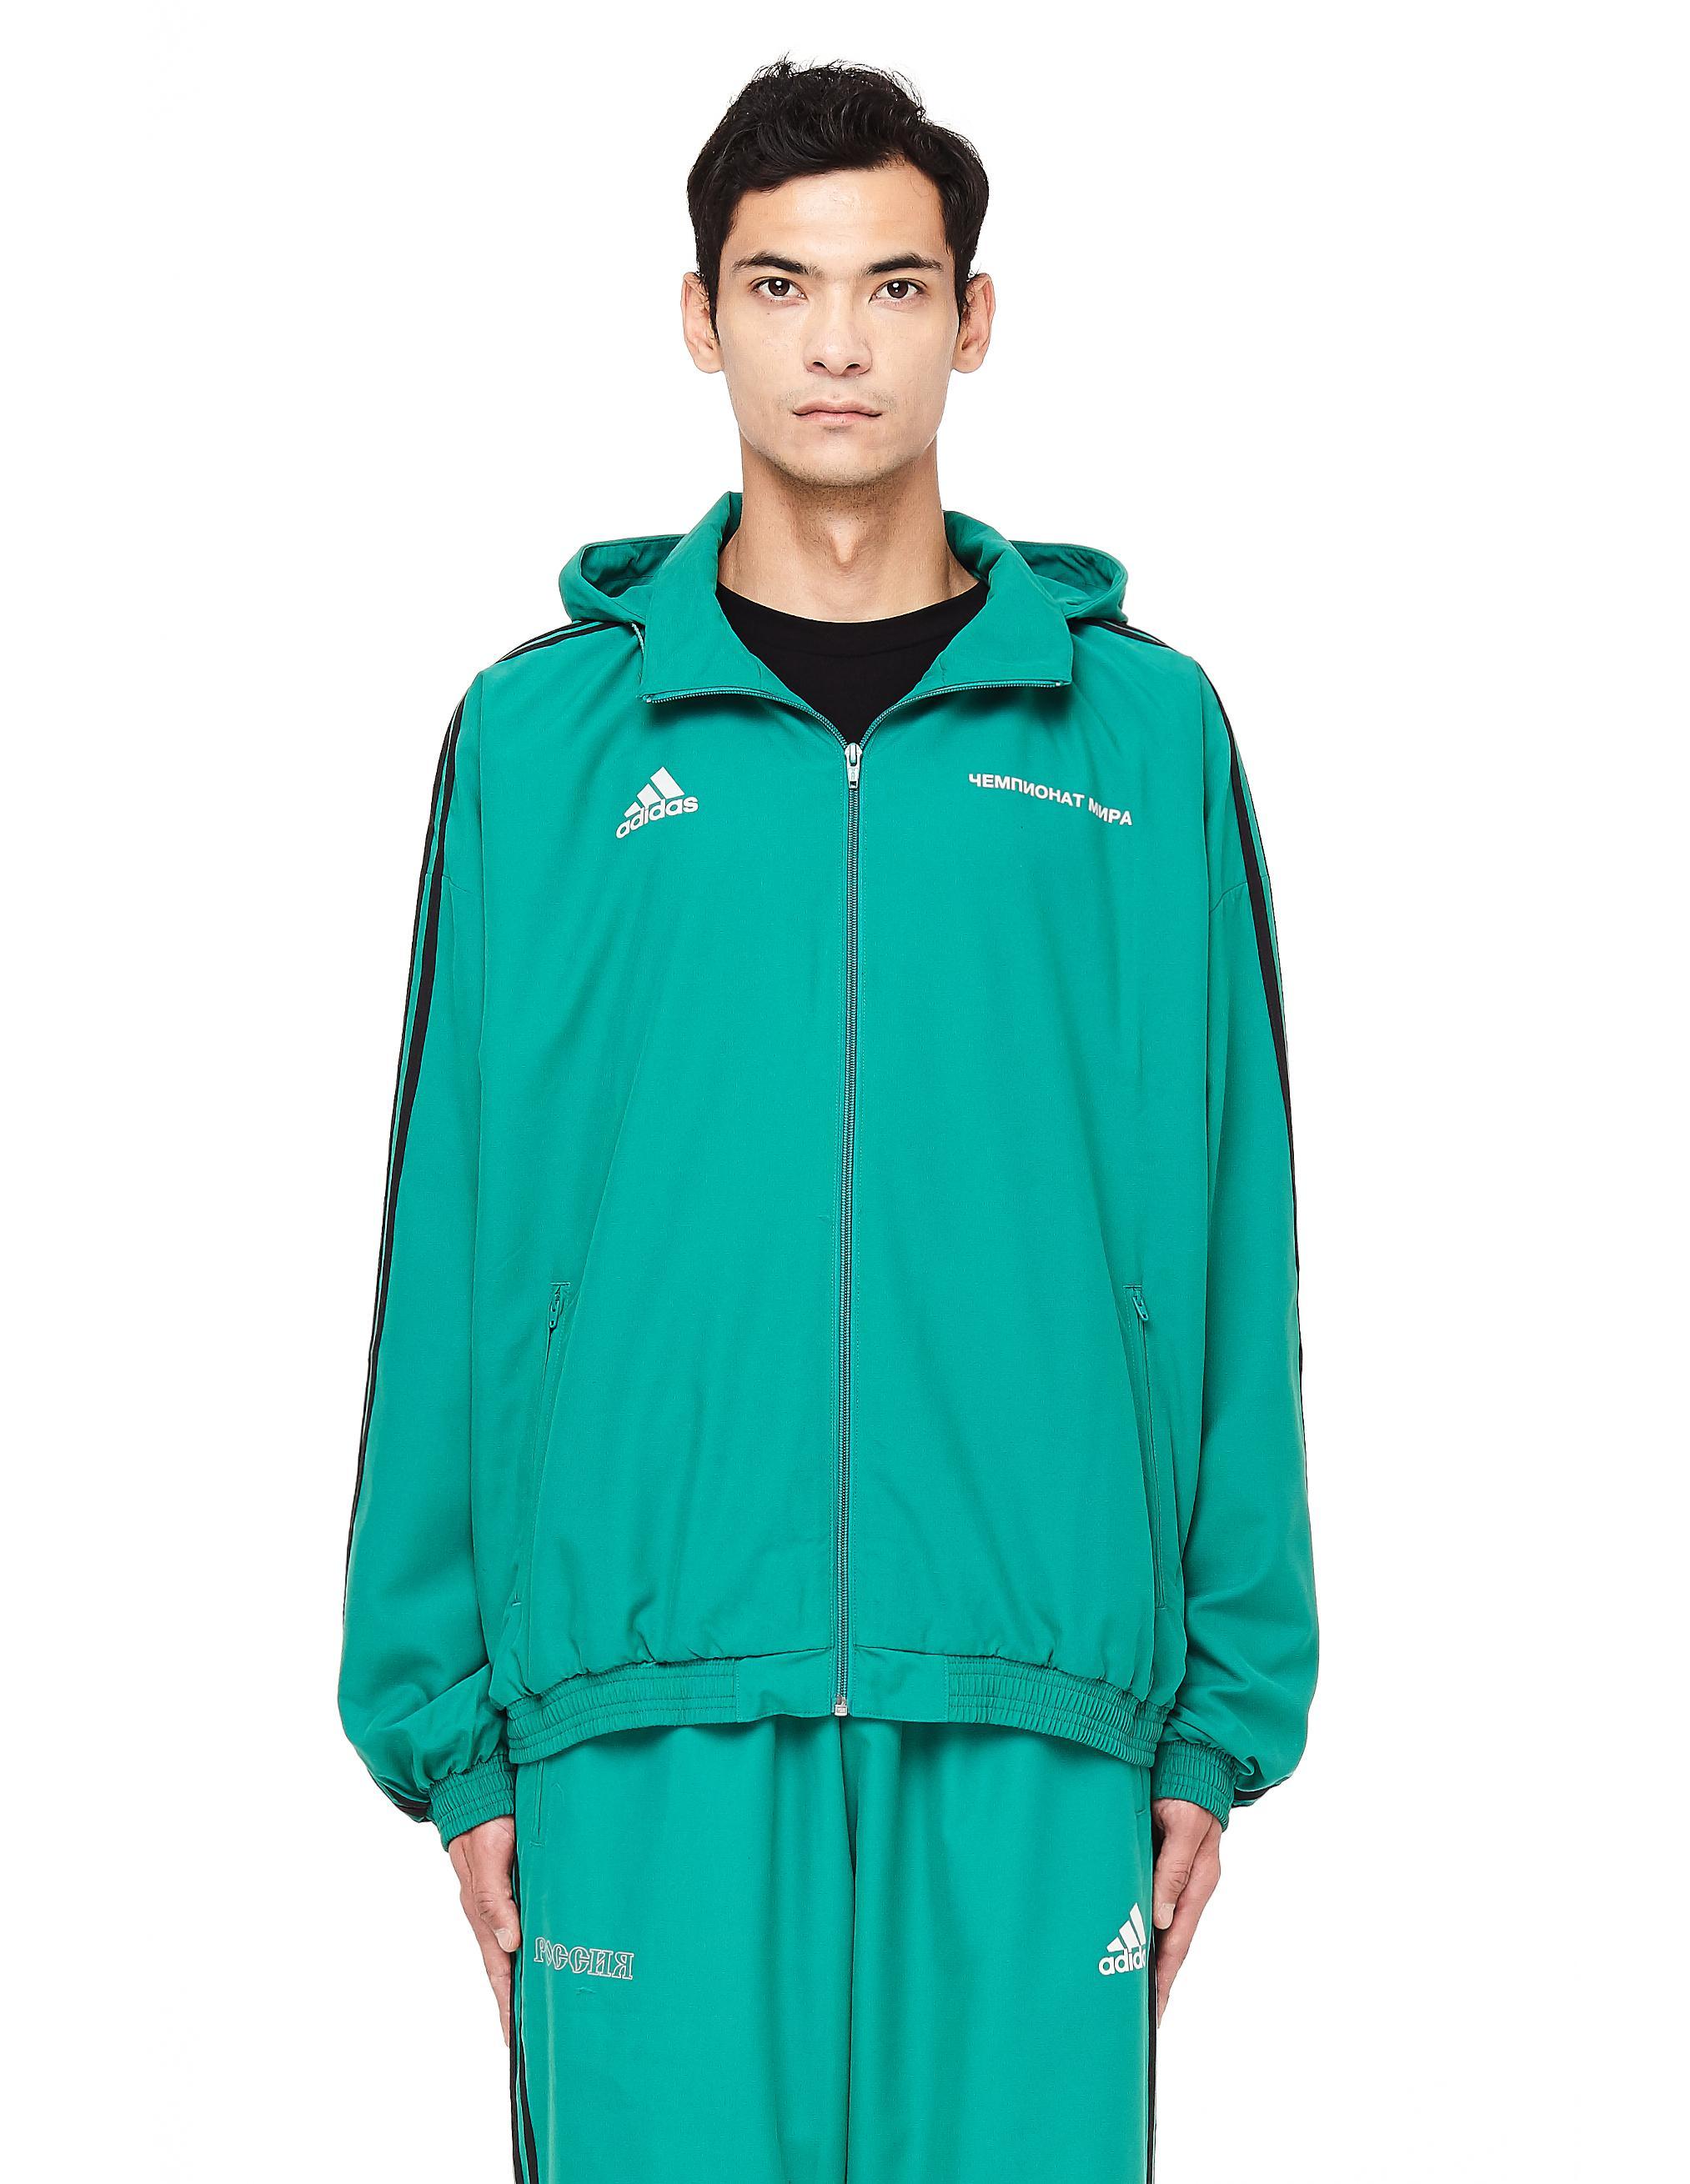 24781d11 Gosha Rubchinskiy Russia Printed Adidas Tracksuit Jacket in Green ...